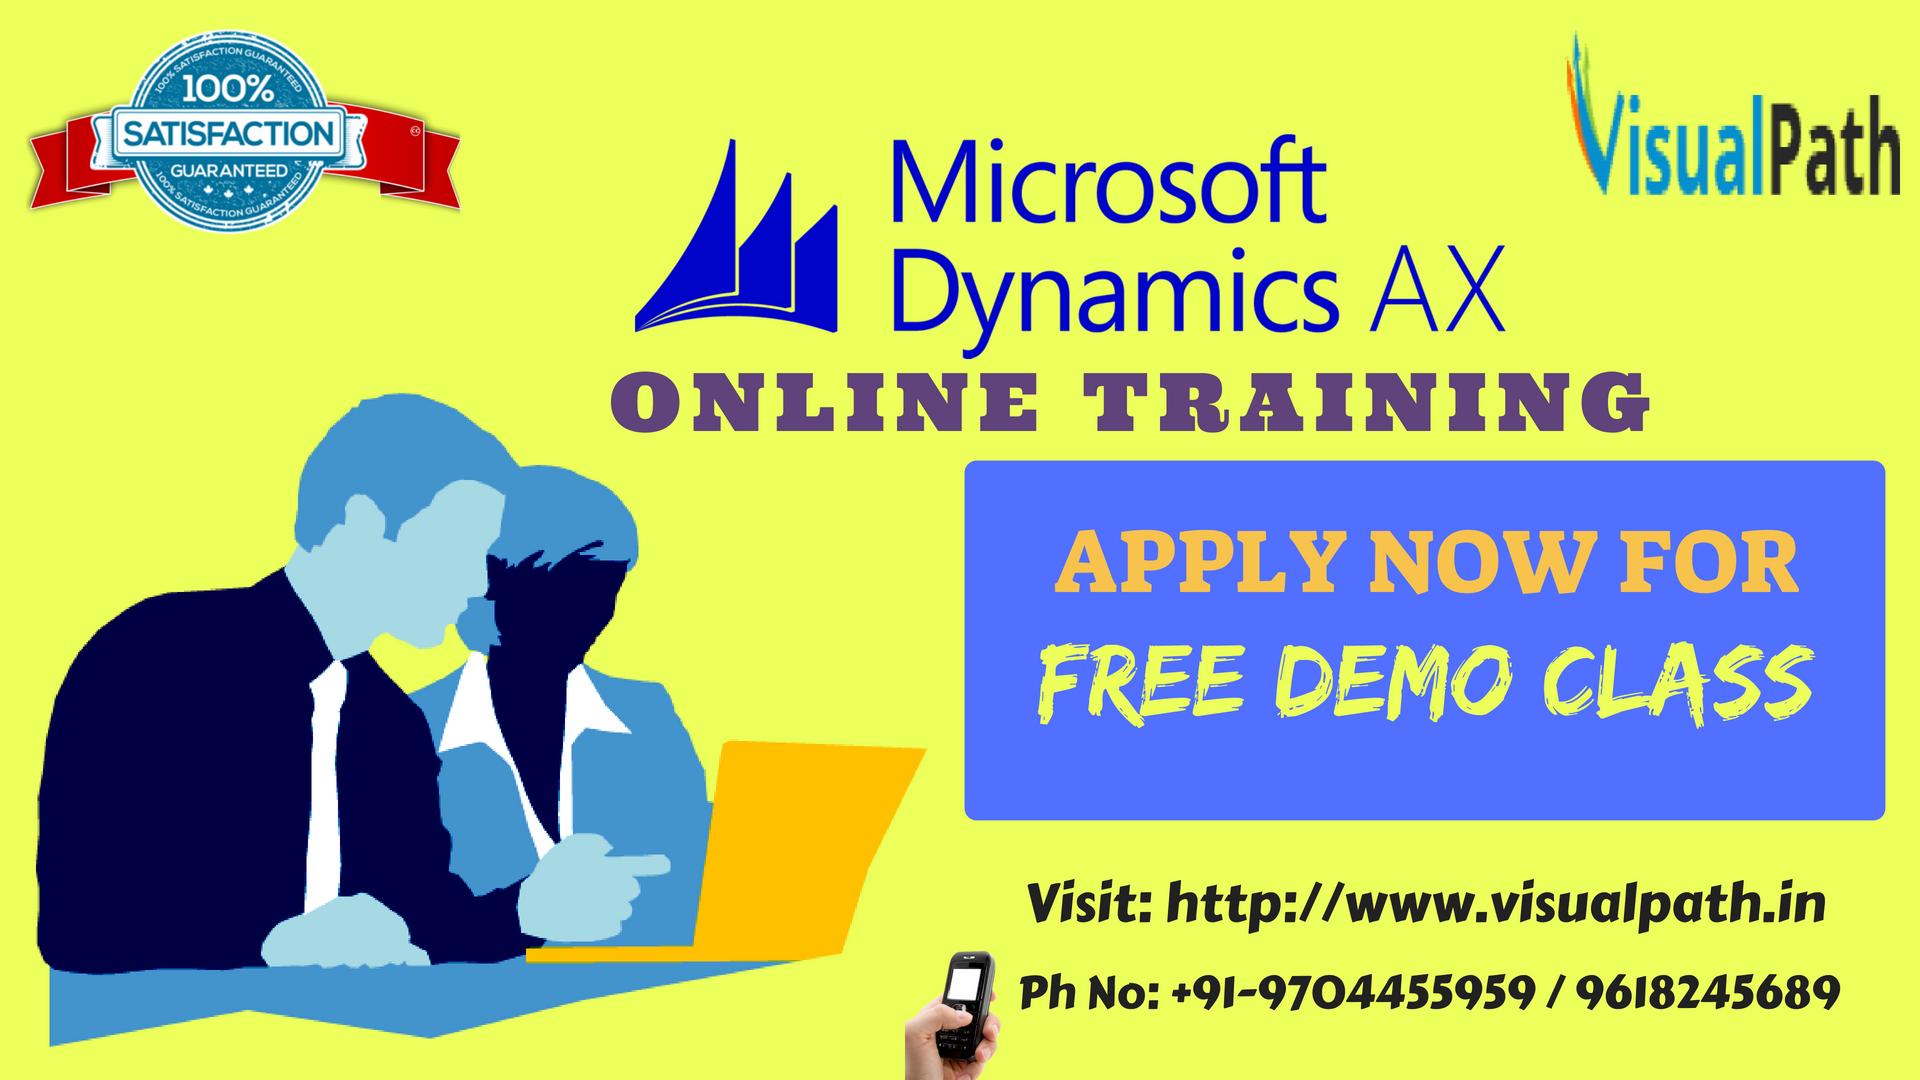 MS Dynamics Online Training | Microsoft Dynamics AX Training